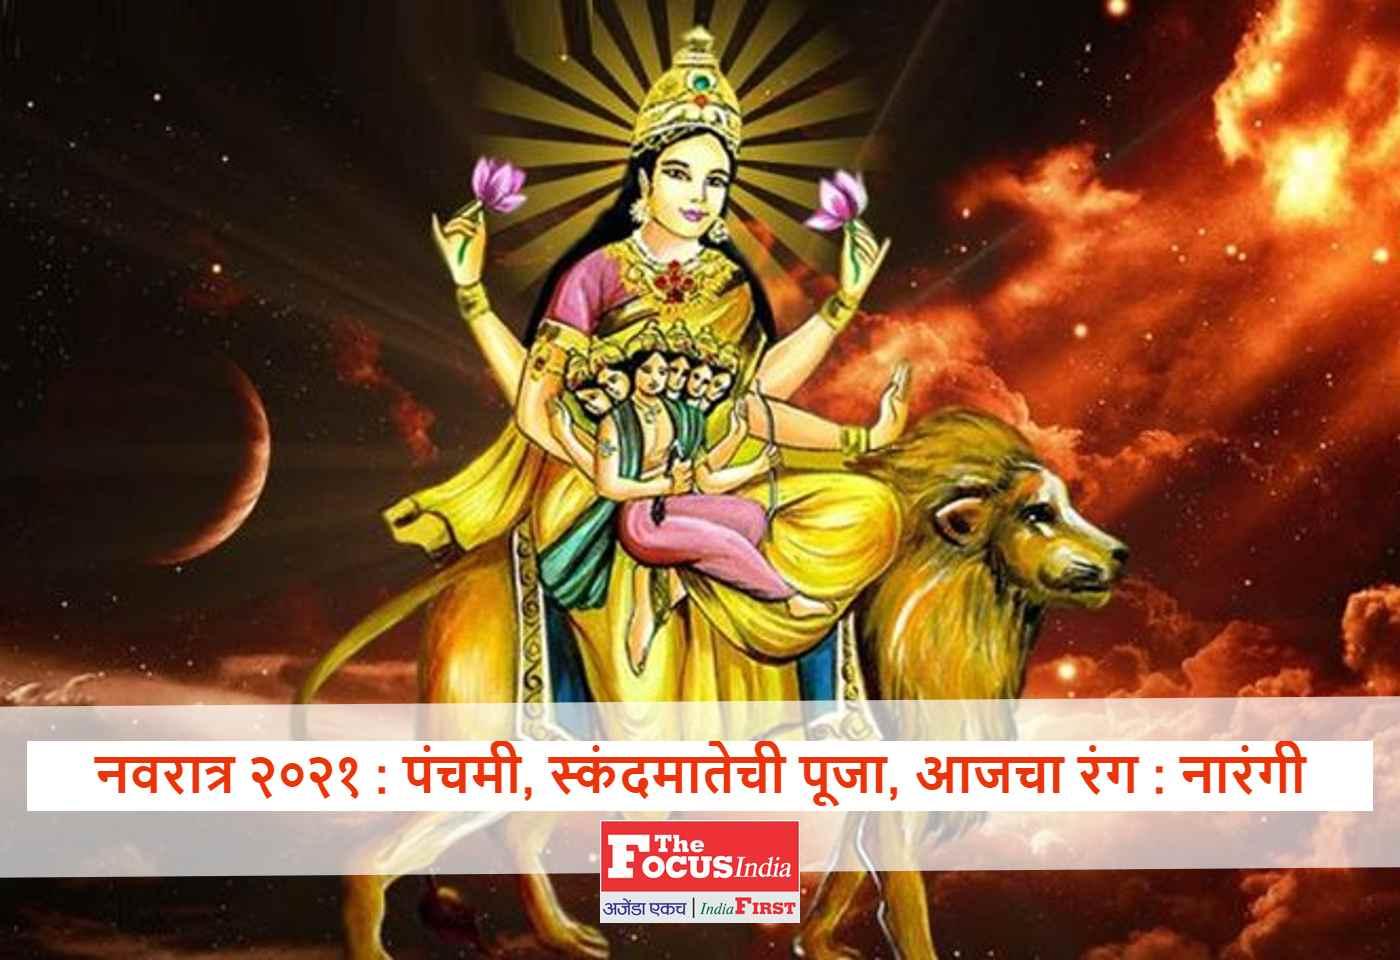 Navratri 2021 Navdurga Mahatmya Devi skandamata worshiped on Fifth Day Of Navratri, Know Historical Story